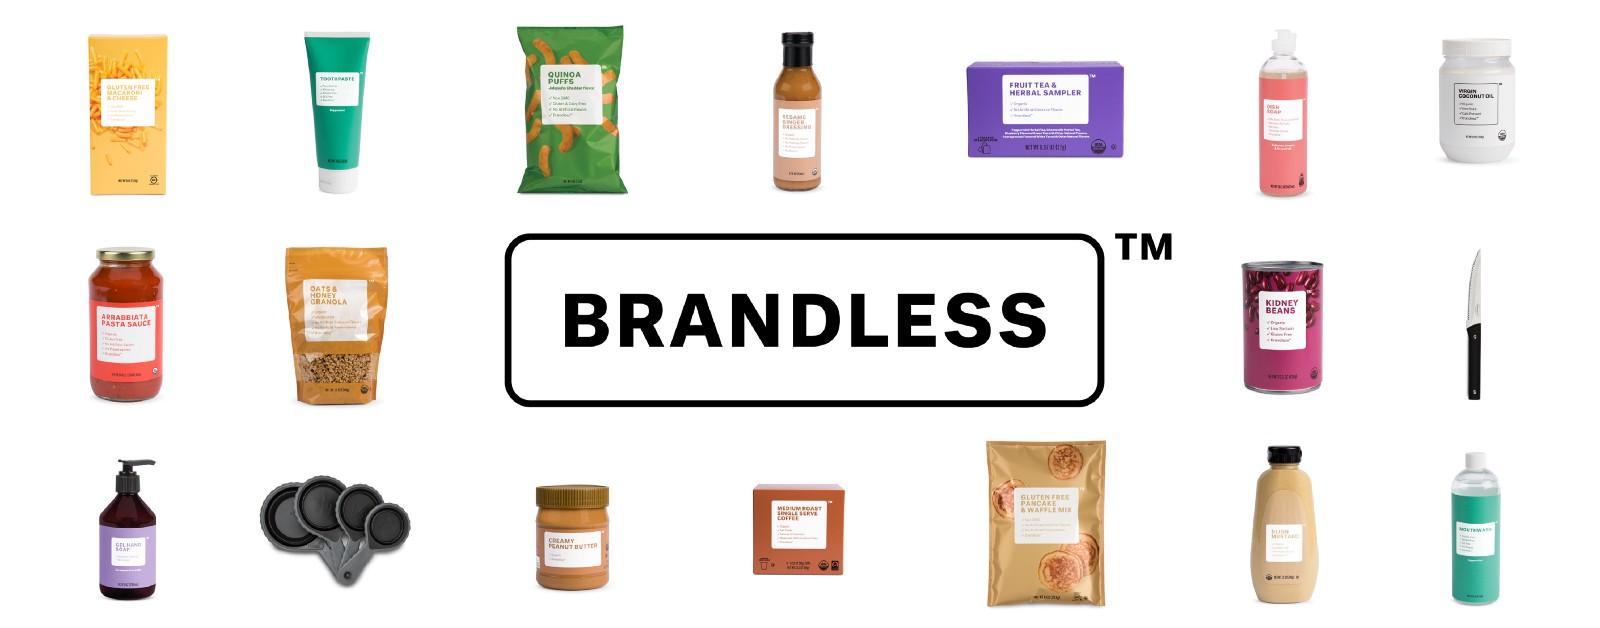 brandless-产品组图